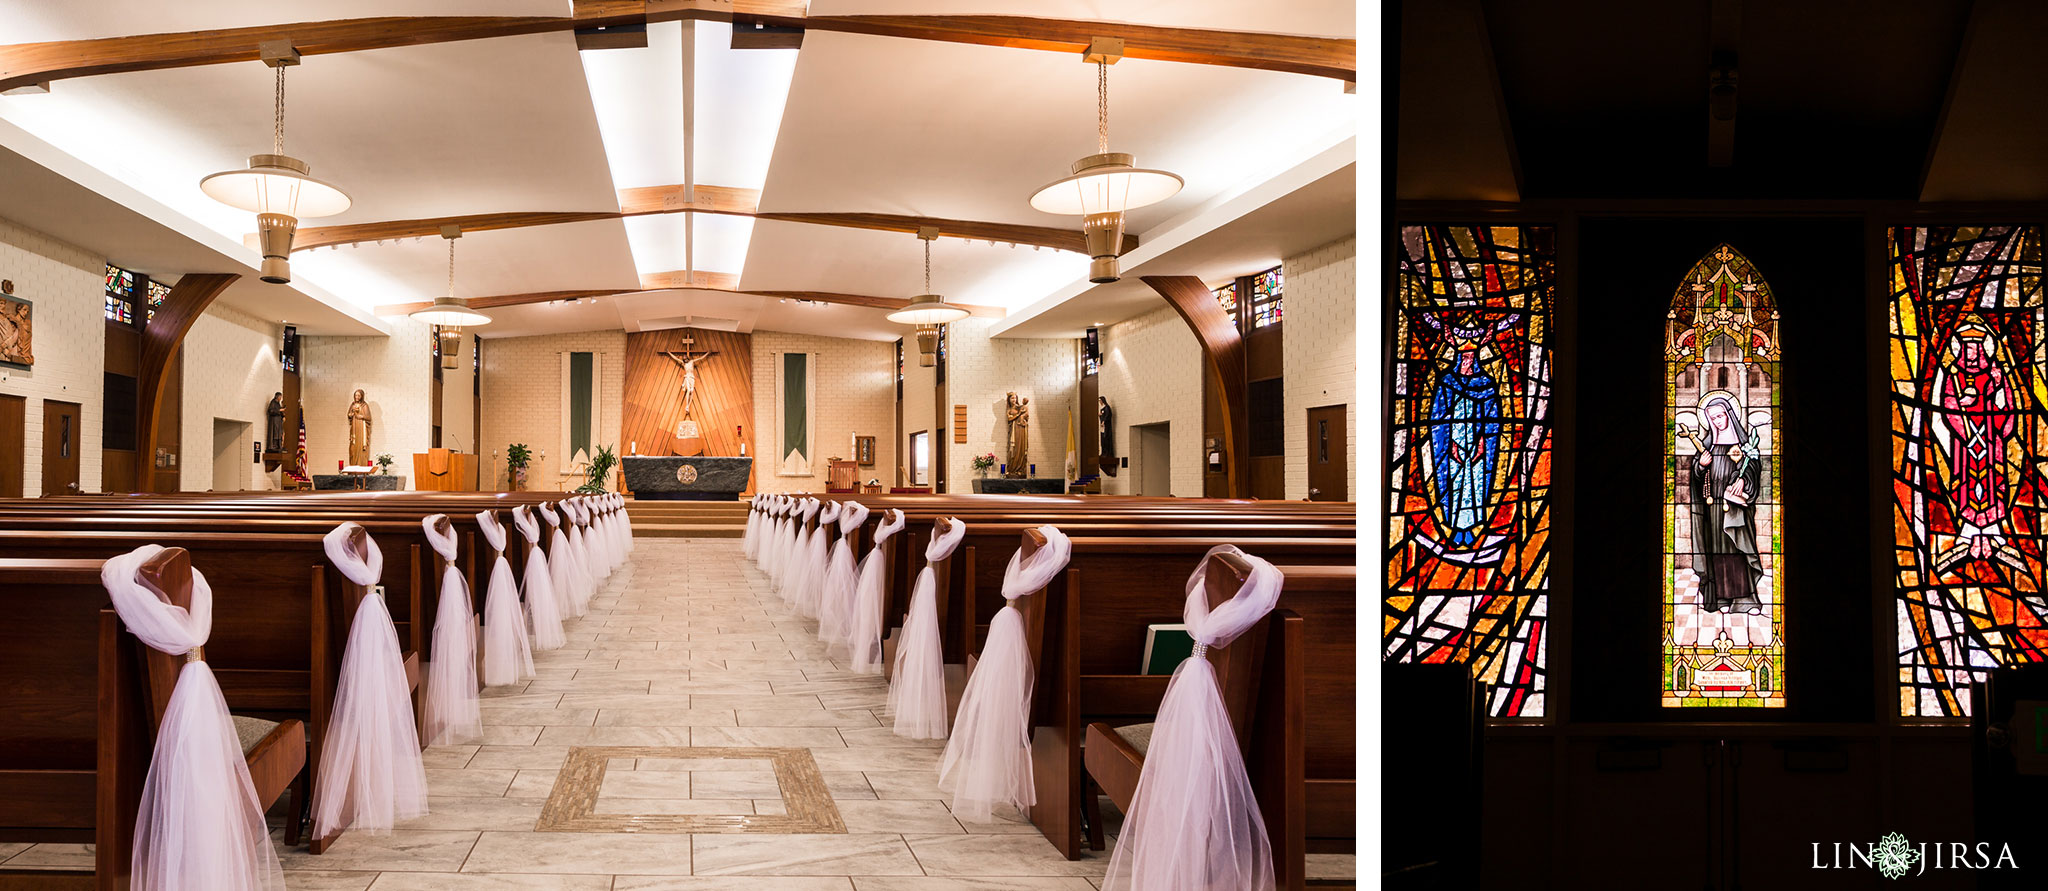 13 St Juliana Falconieri Church Fullerton Wedding Photography